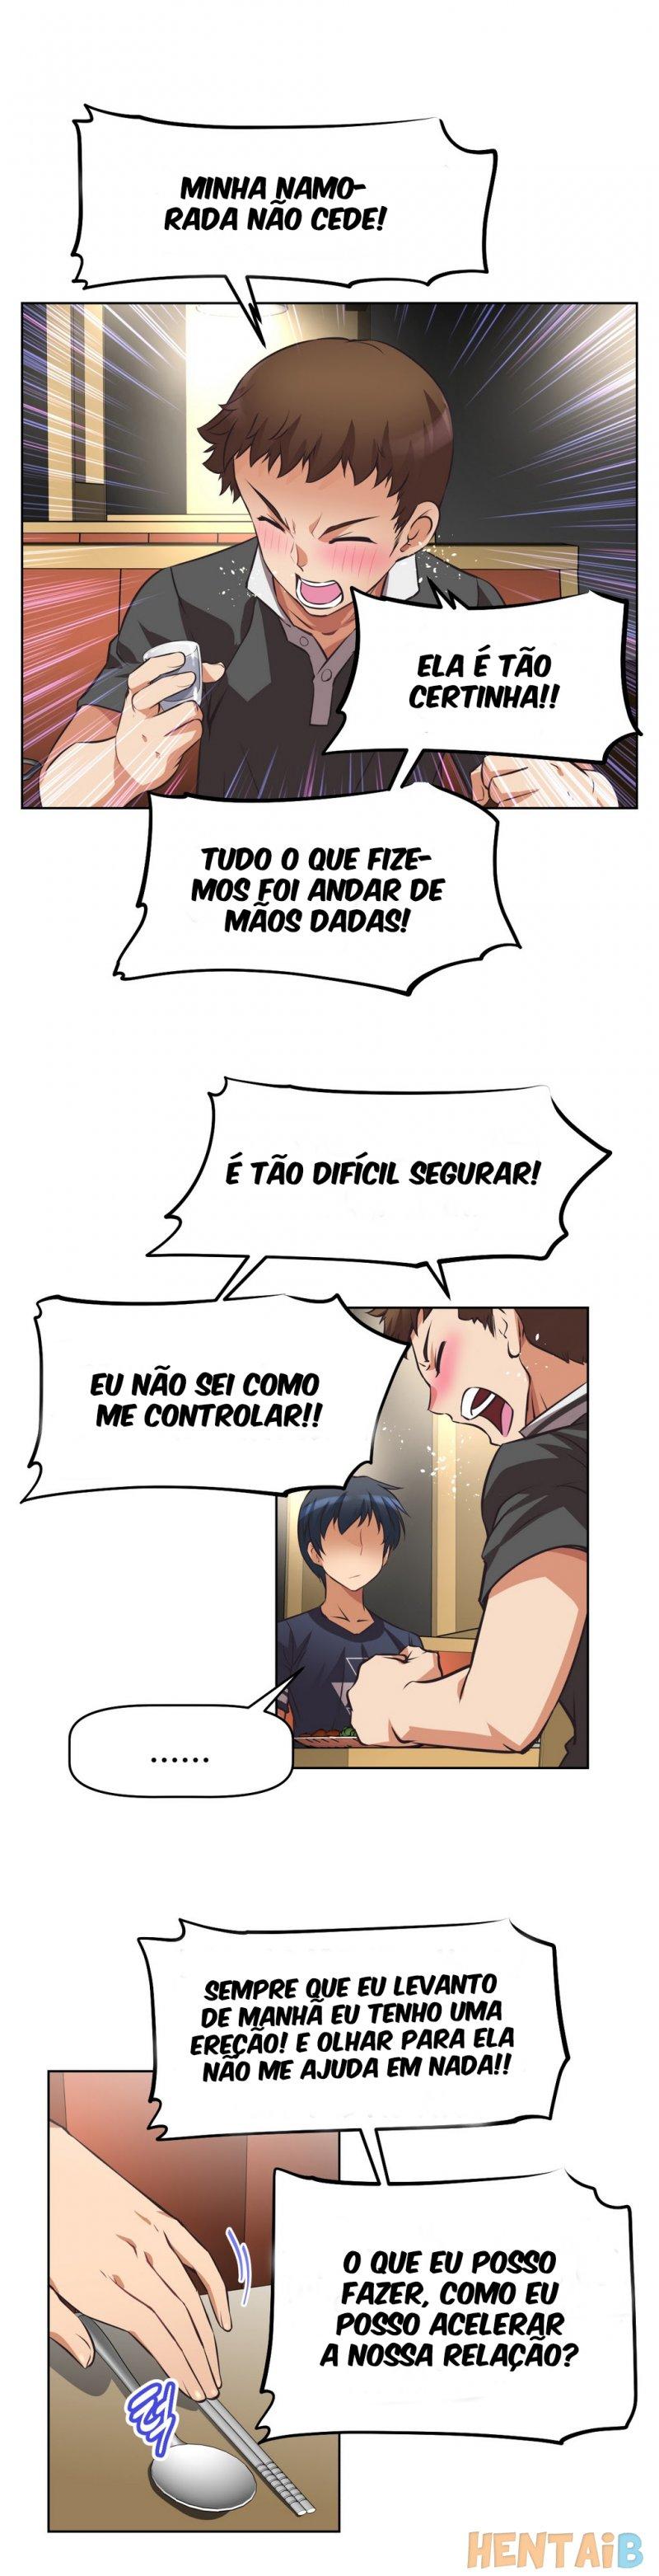 brawling go 06 24 hentai brasil hq - Brawling Go! #06 Hentai HQ